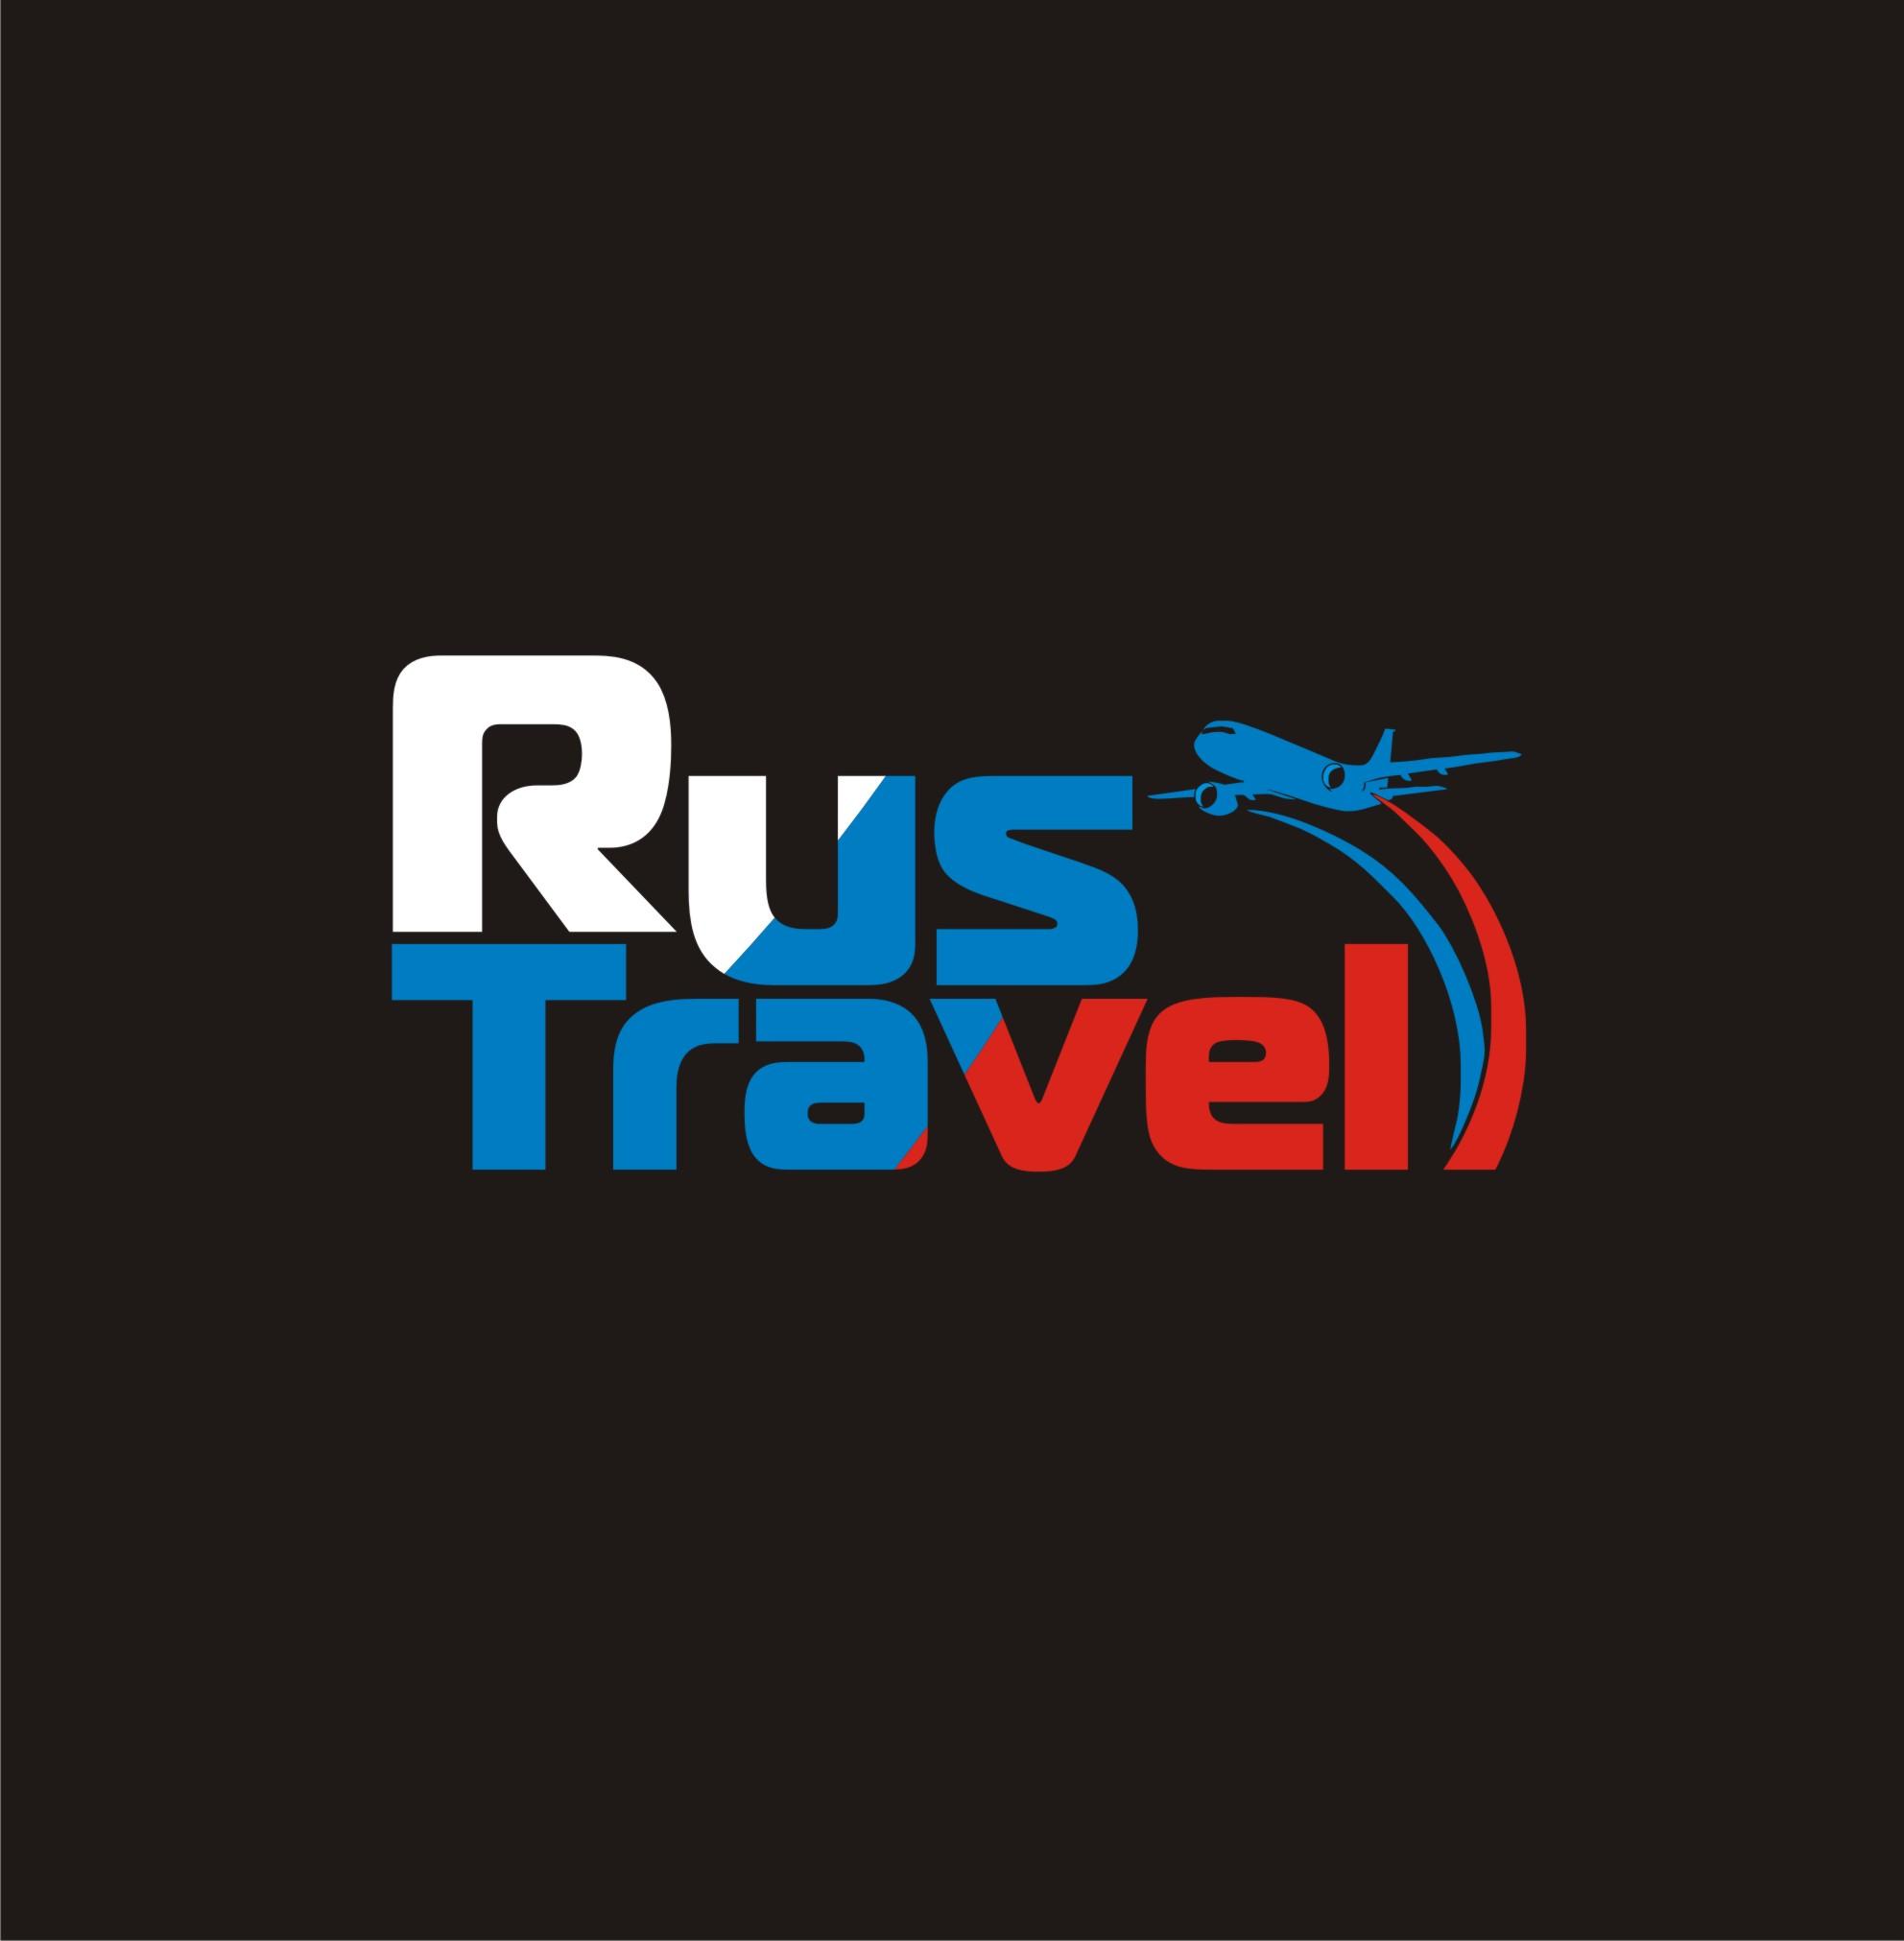 Разработка логотипа фото f_3245b3dbb1d48e2b.jpg